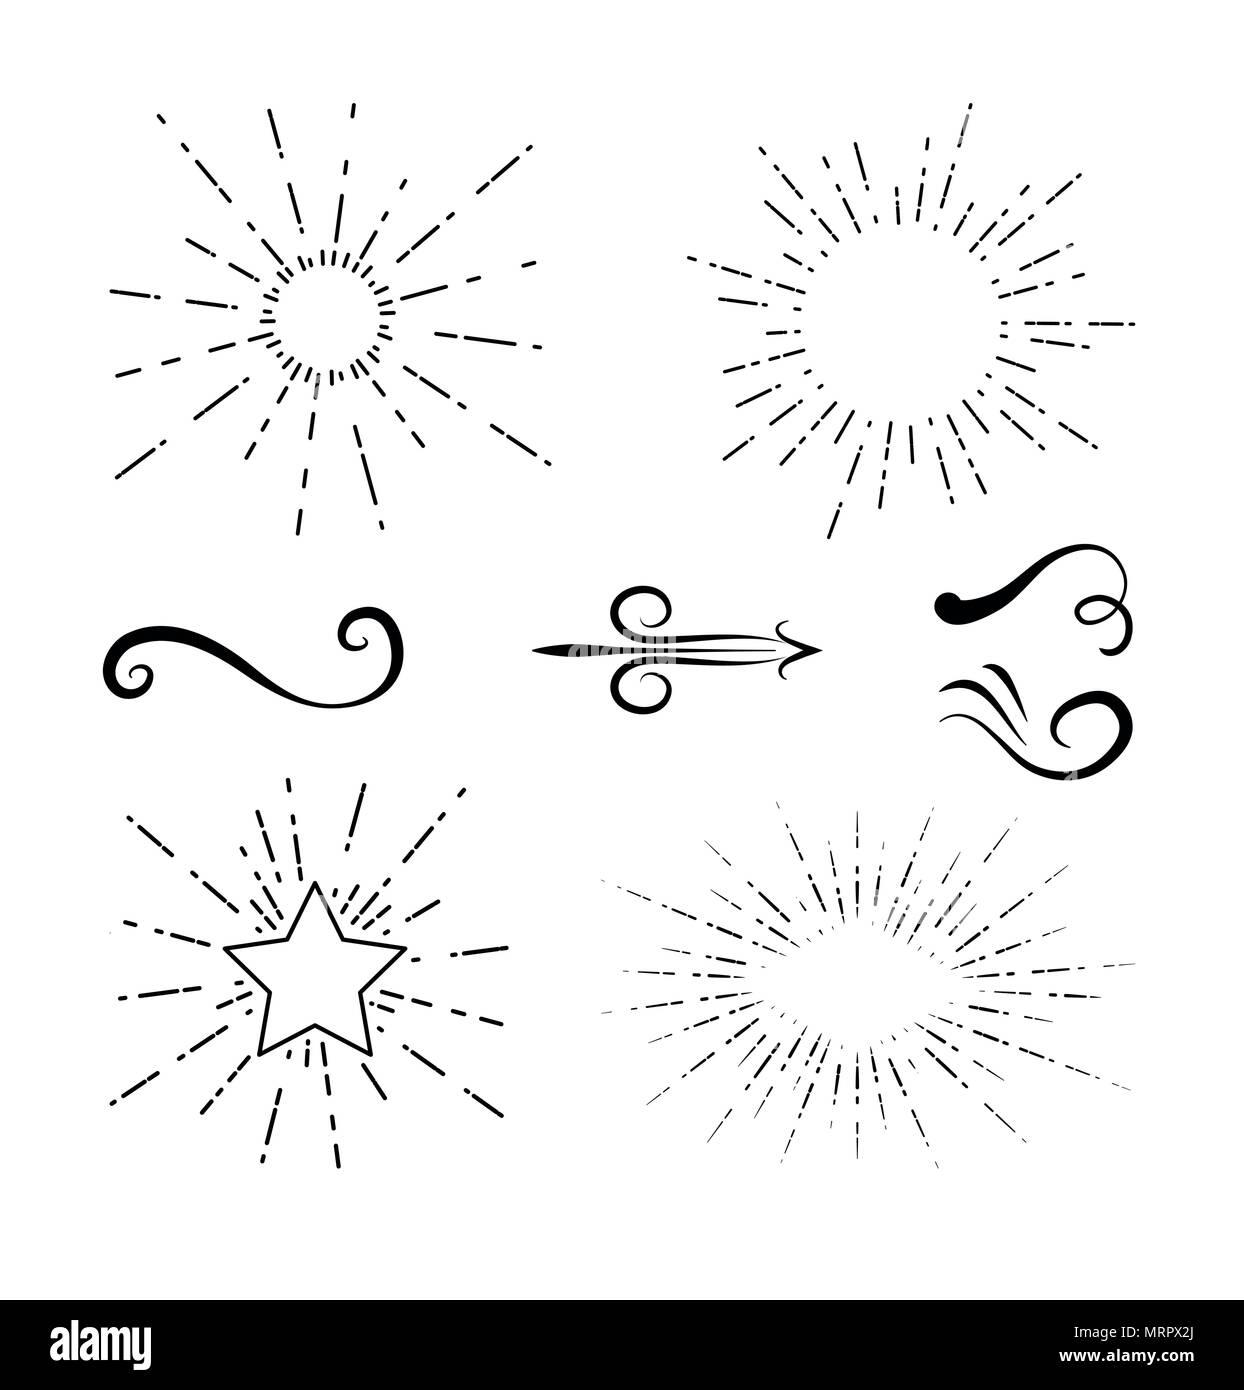 Decorative swirls hand draw - Stock Image